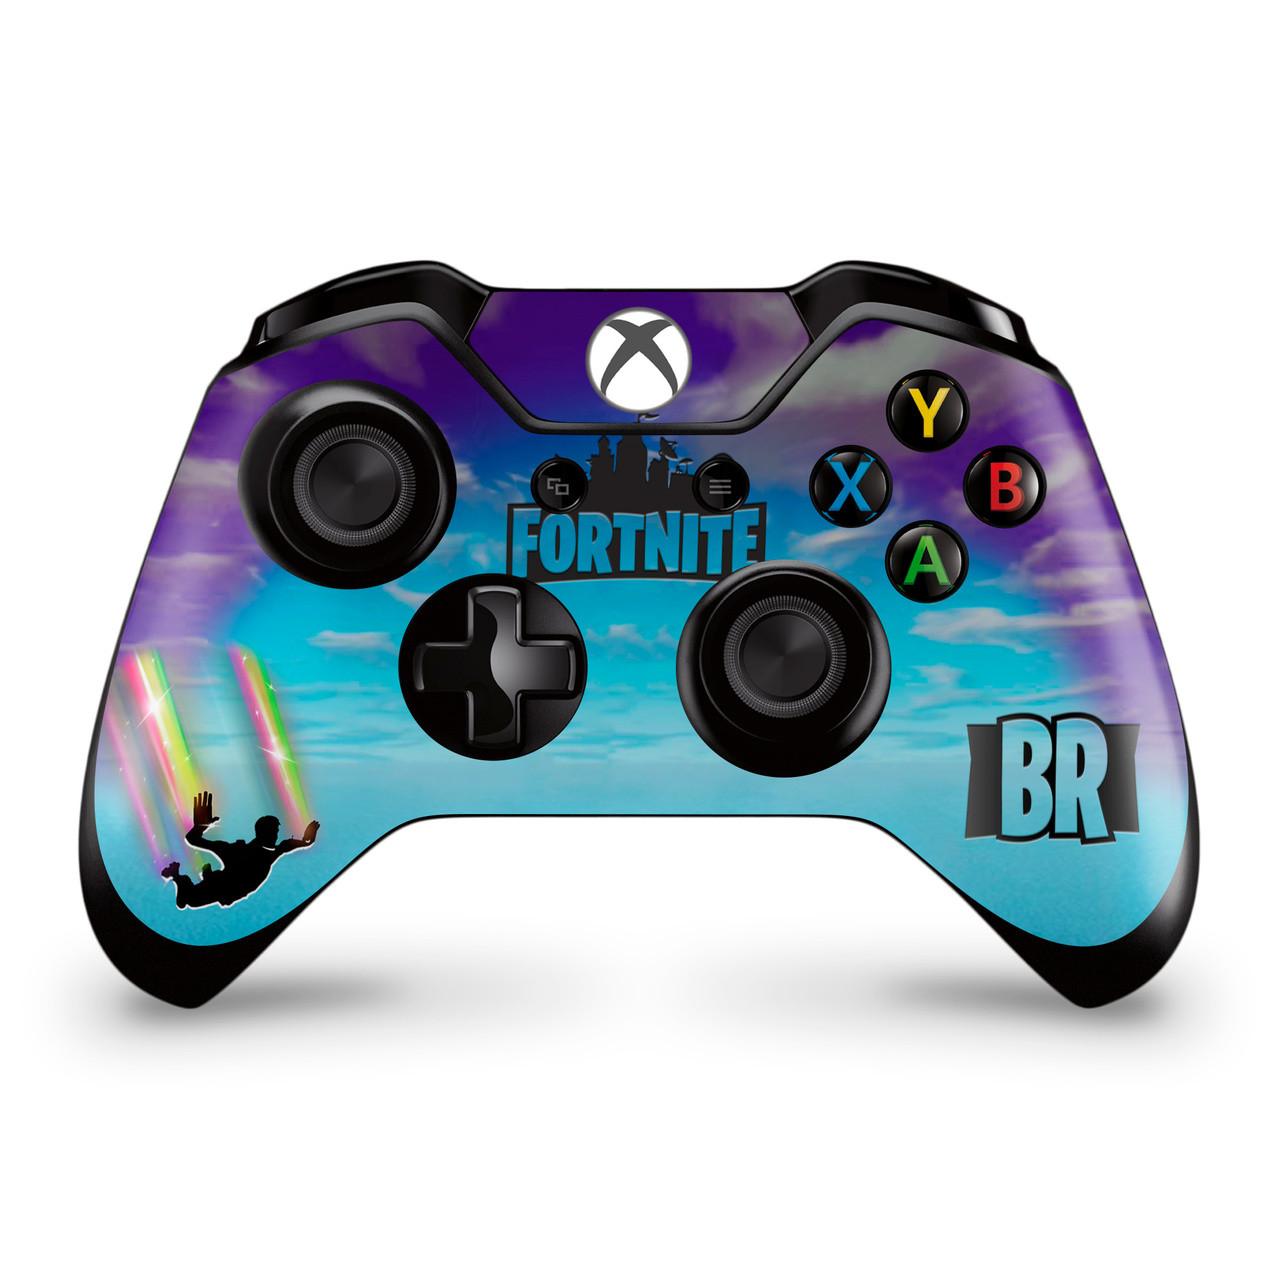 Xbox Elite Controller Fortnite Keybinds